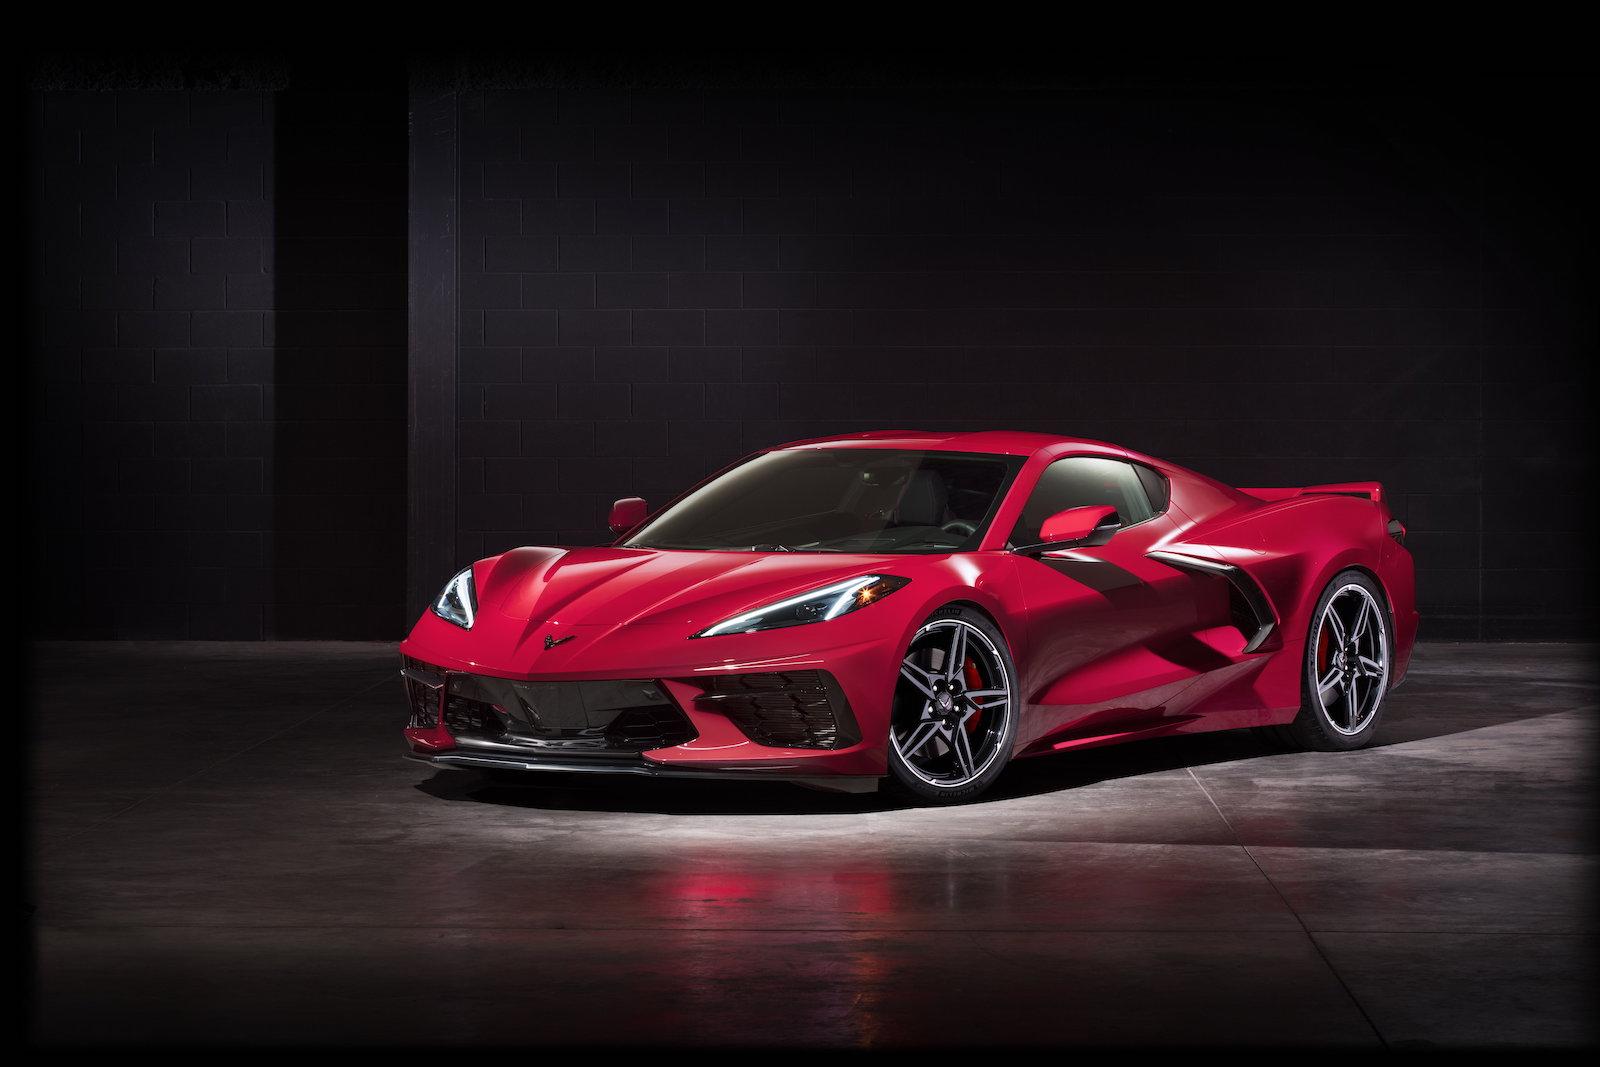 495 Ps V8 Saugmotor Und Mittelmotor Die Neue Corvette C8 Stingray 2020 Trackdaysport